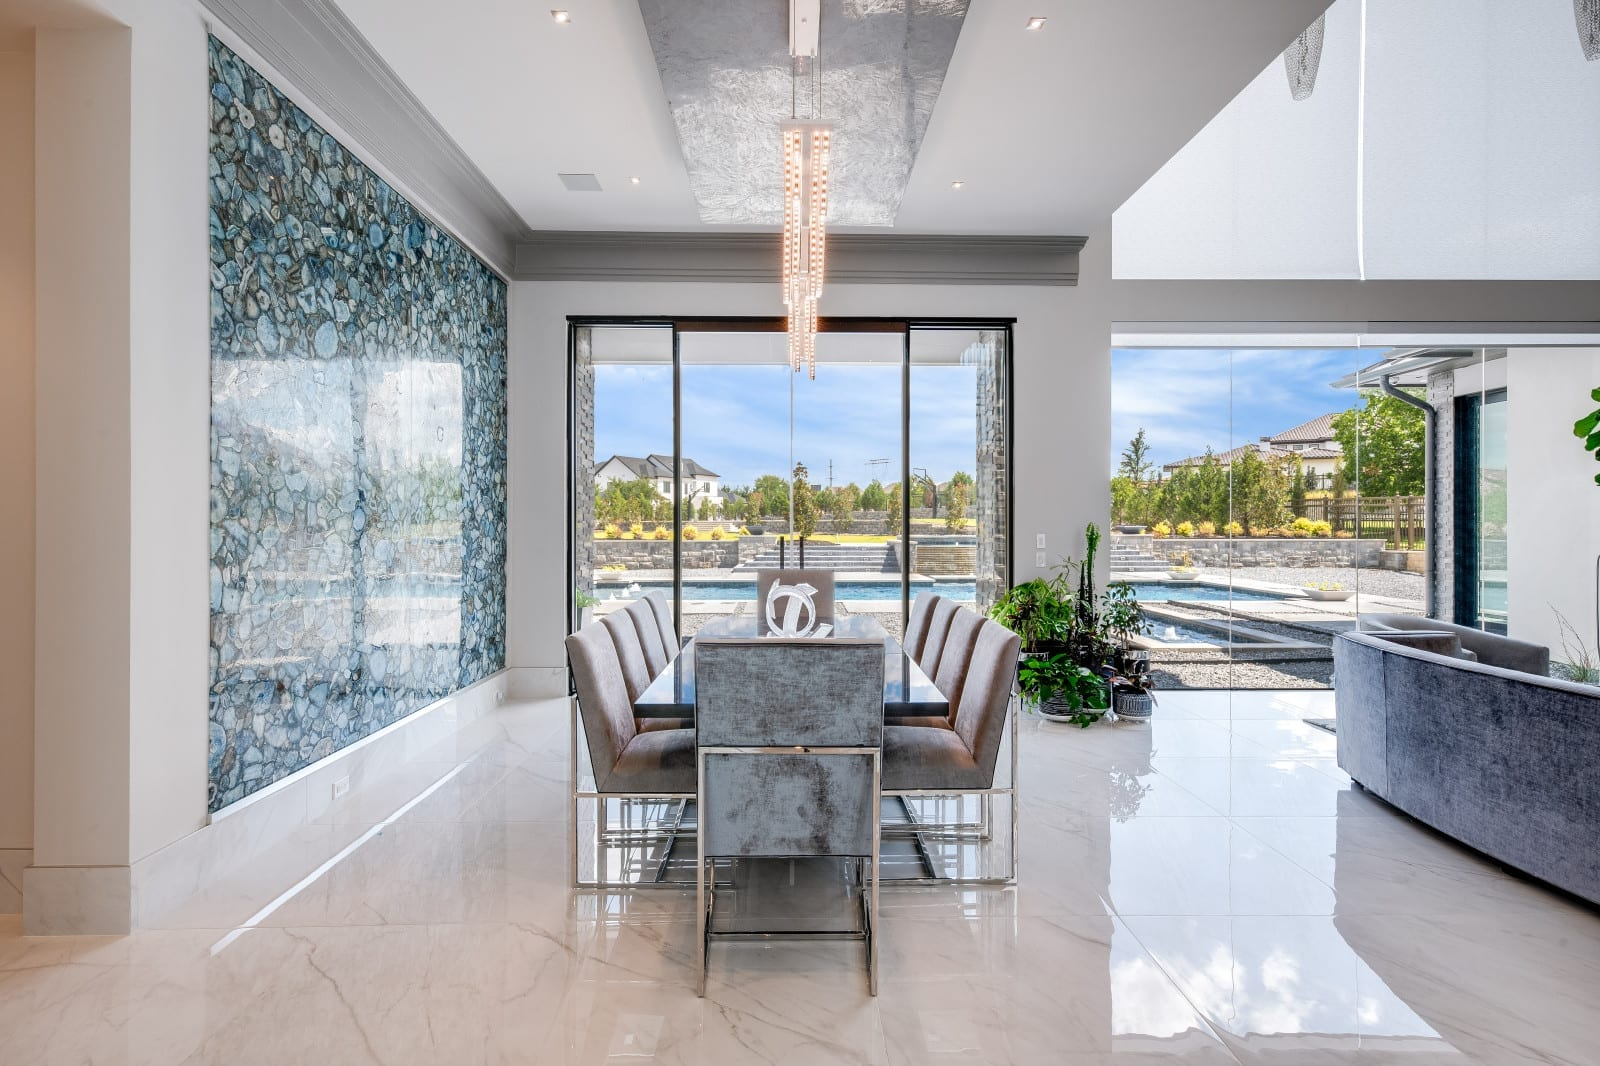 Custom Home Build and Interior Design # 19 - Millennial Design + Build, Custom Home Builders in Dallas Texas, modern style homes, Property Evaluator, Interior Designers, using BIM Technology and Home 3D Model.